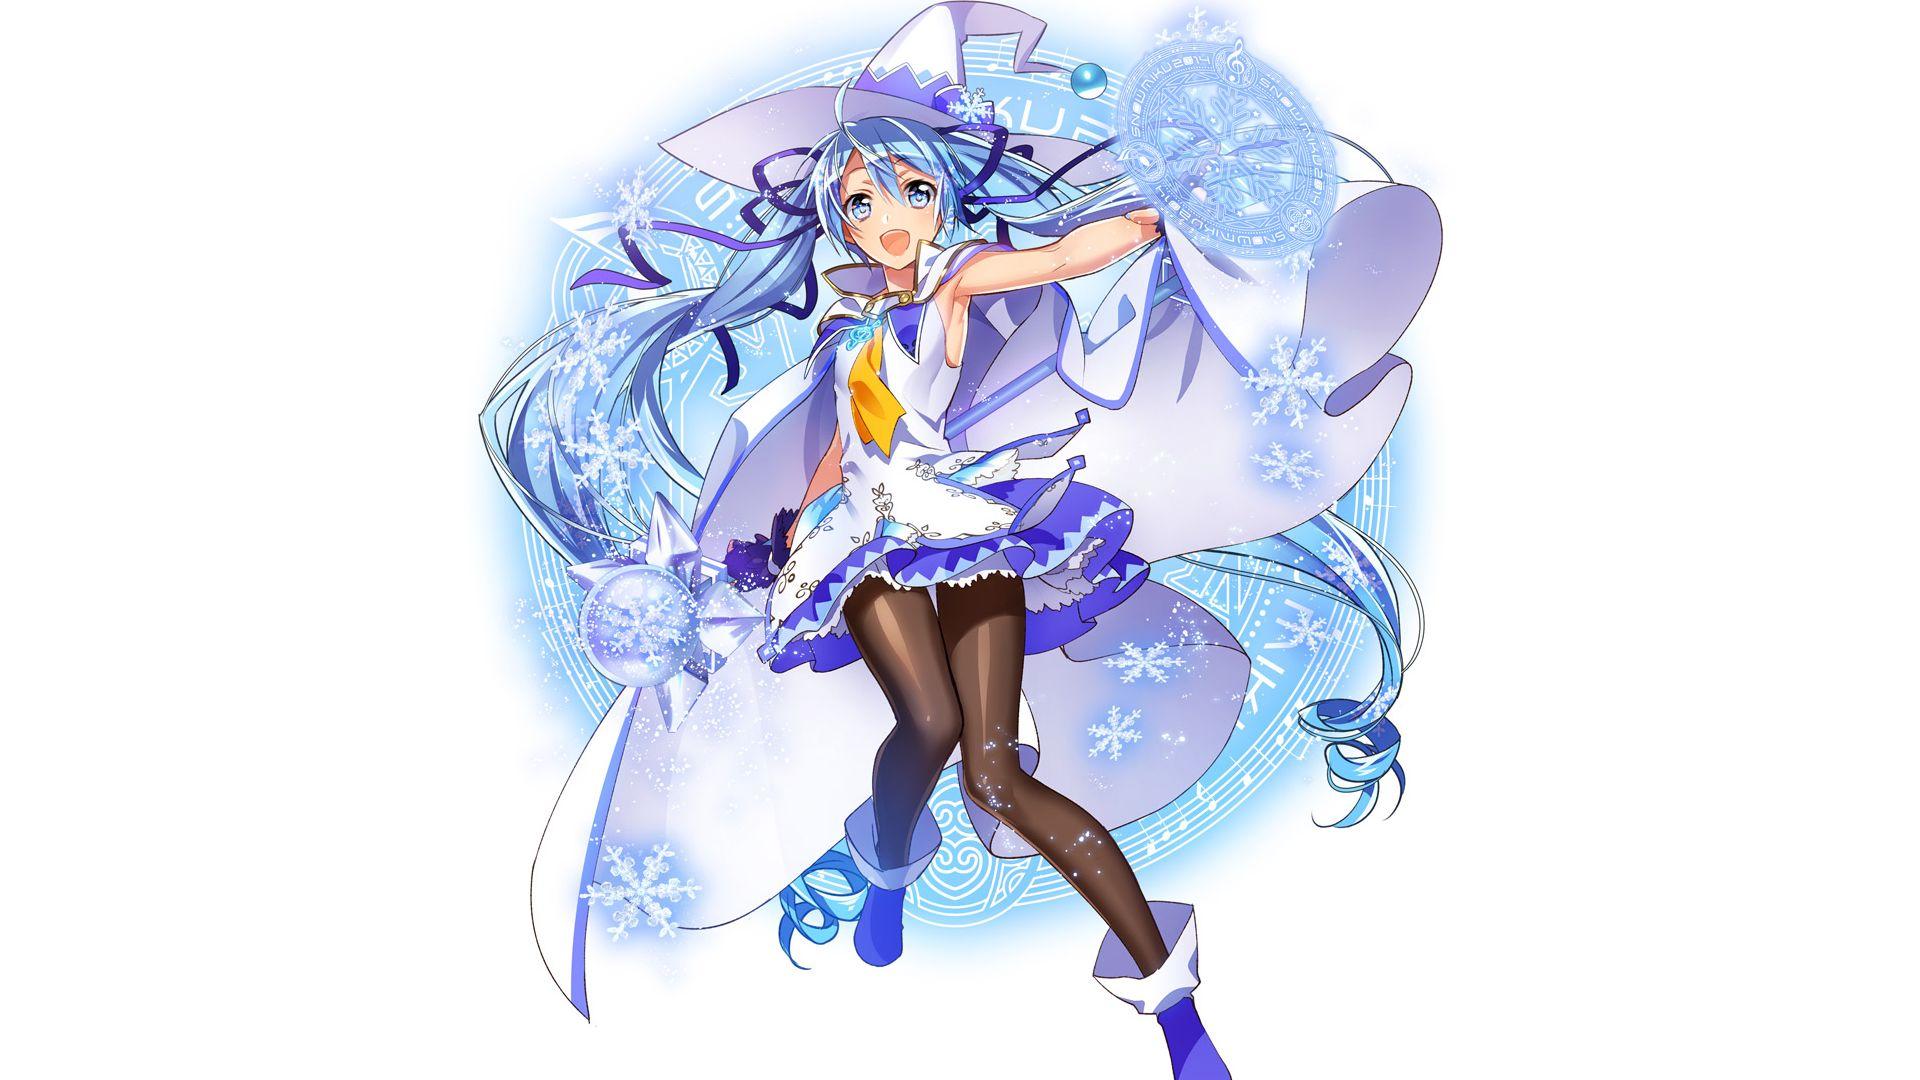 Wallpaper Blue hair, anime girl, Hatsune Miku